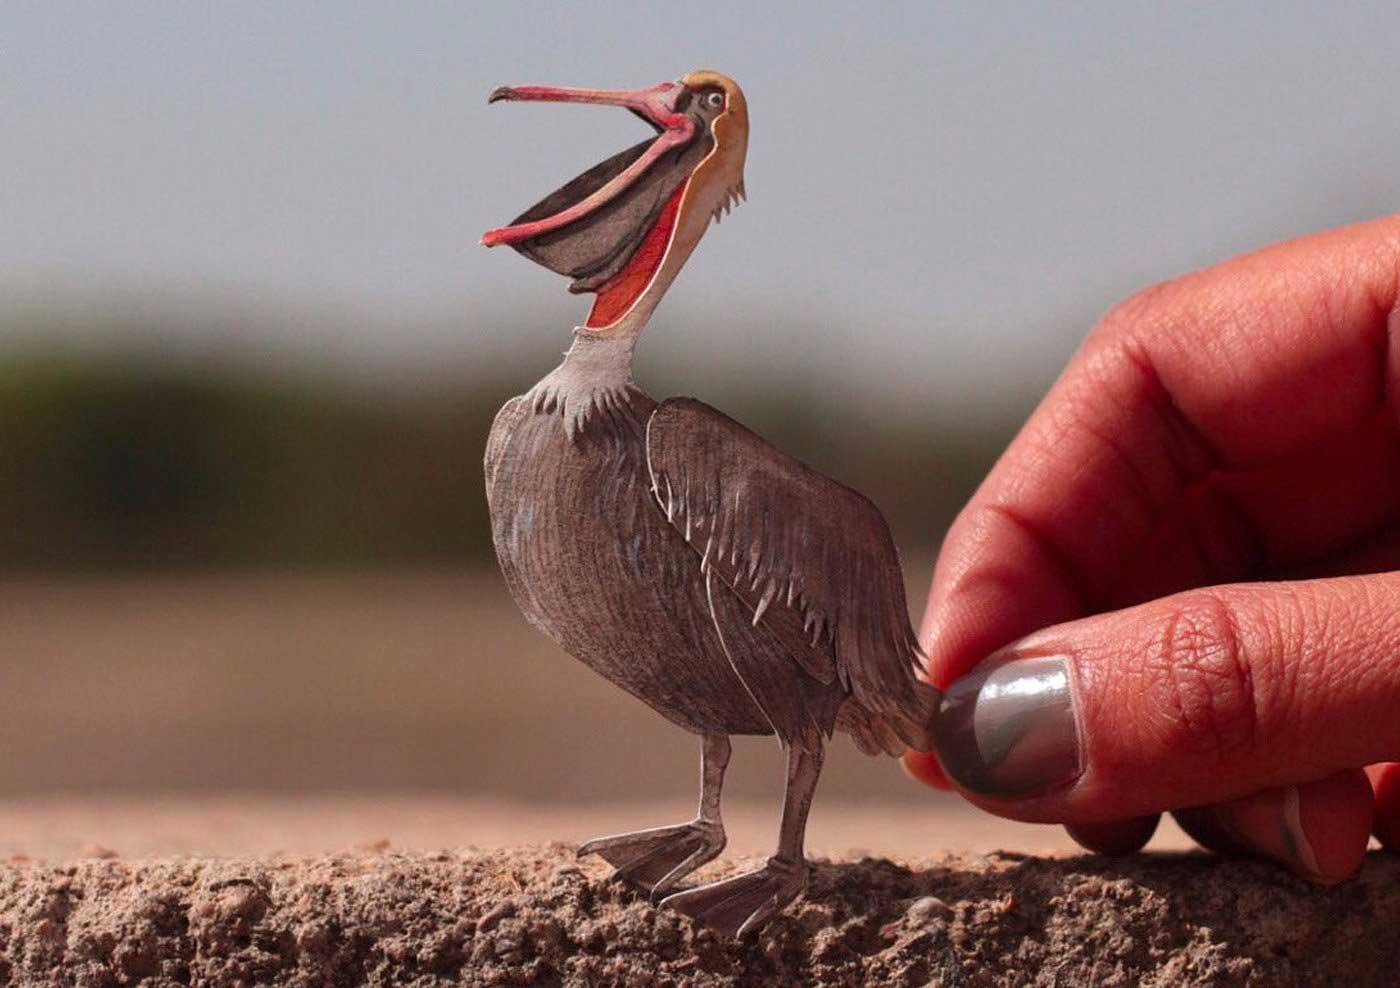 365 Papier-Vögel Nayan-and-Vaishali-miniature-birds-voegel_10